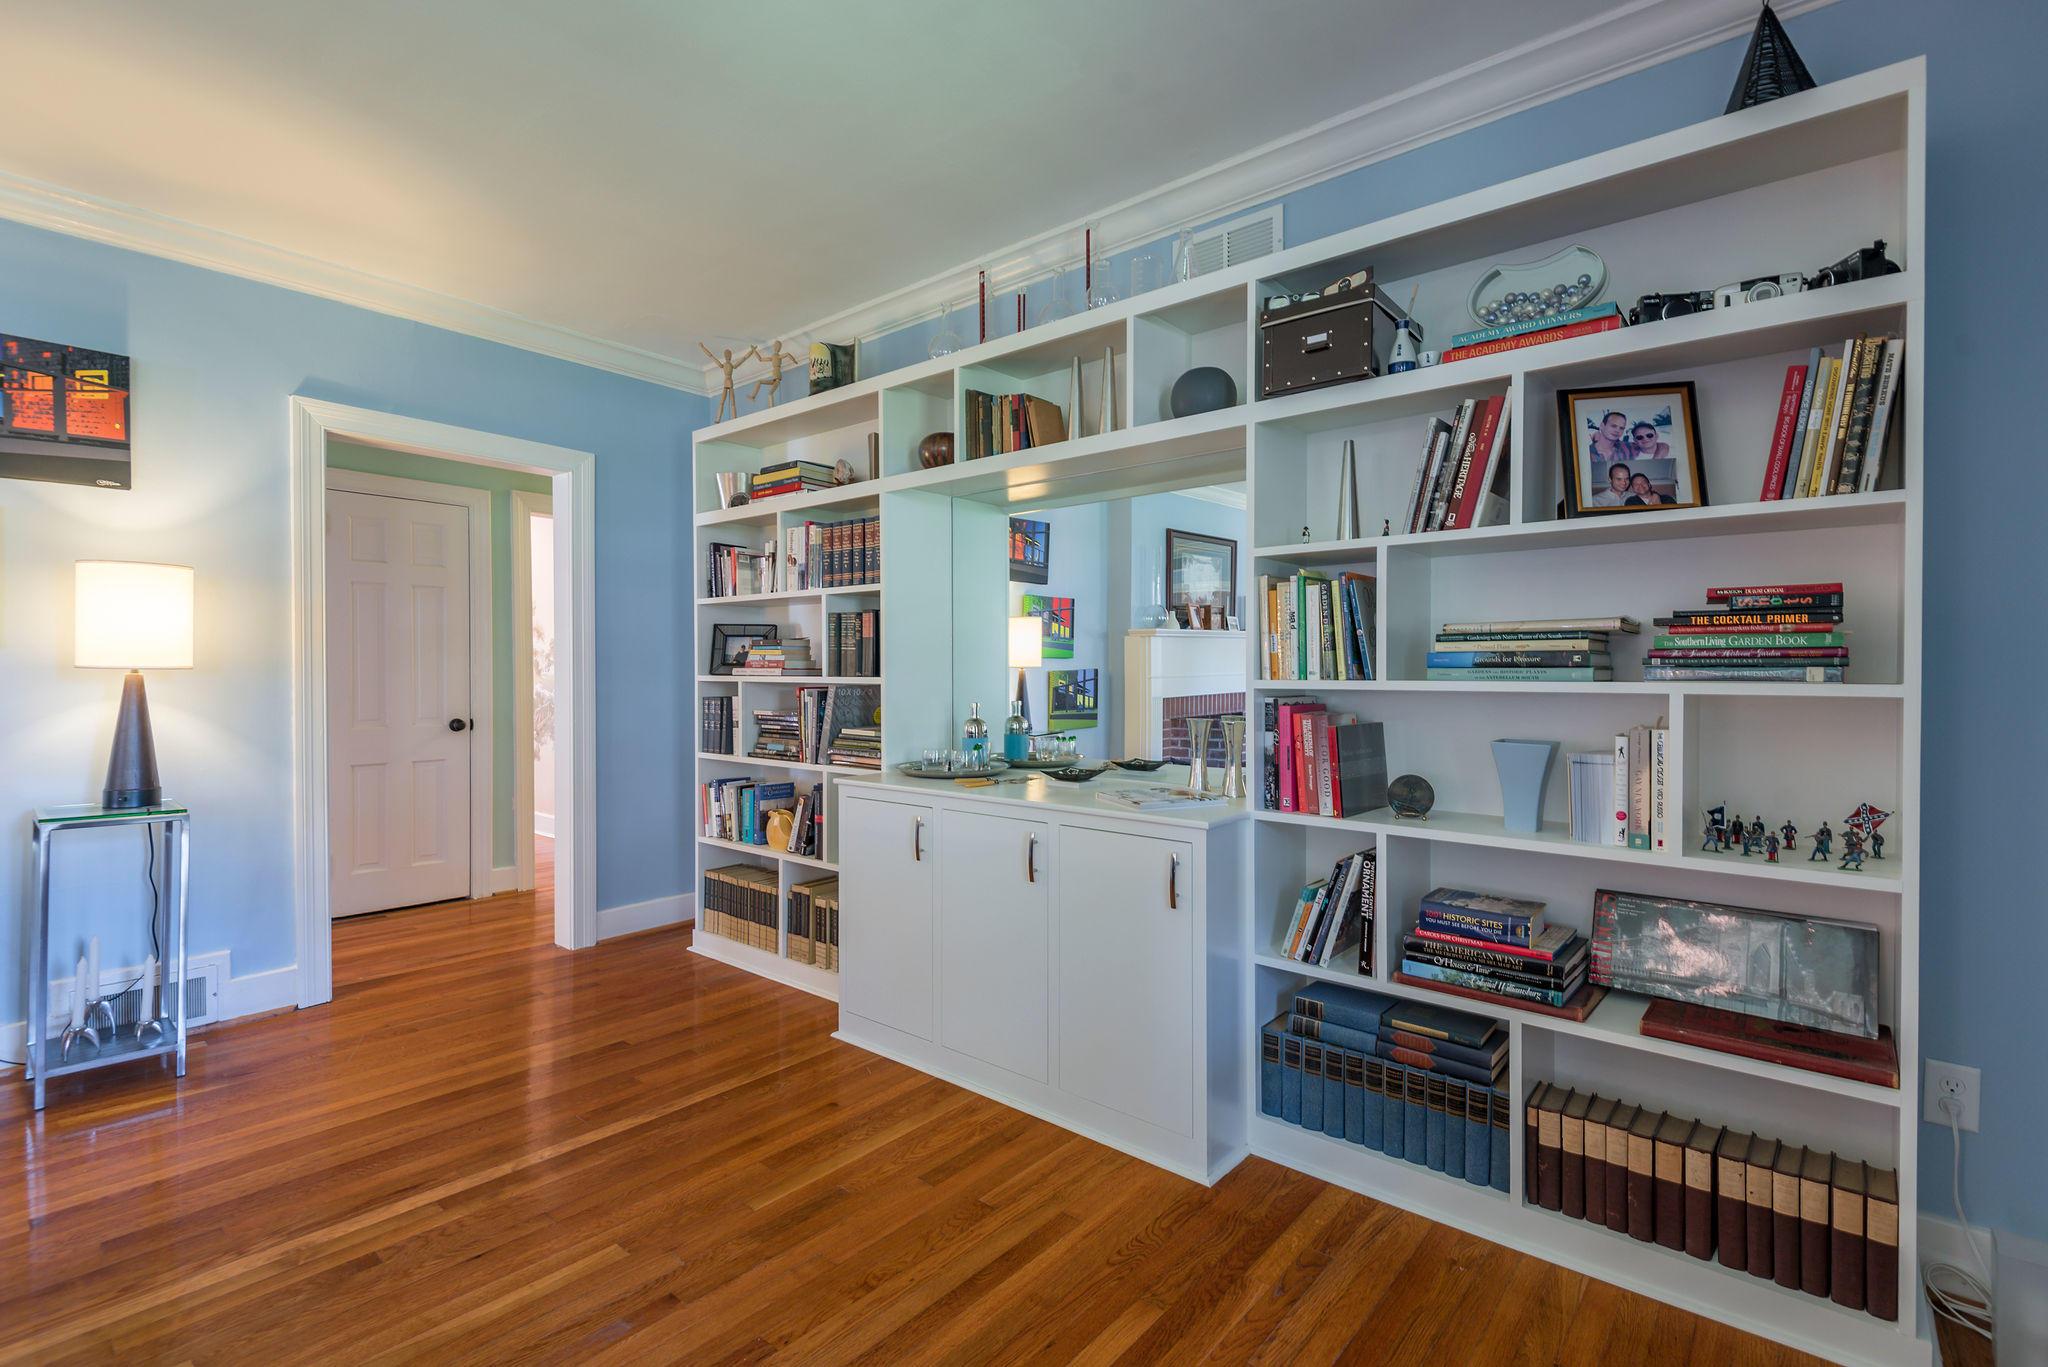 Sylvan Shores Homes For Sale - 450 Polony, Charleston, SC - 4